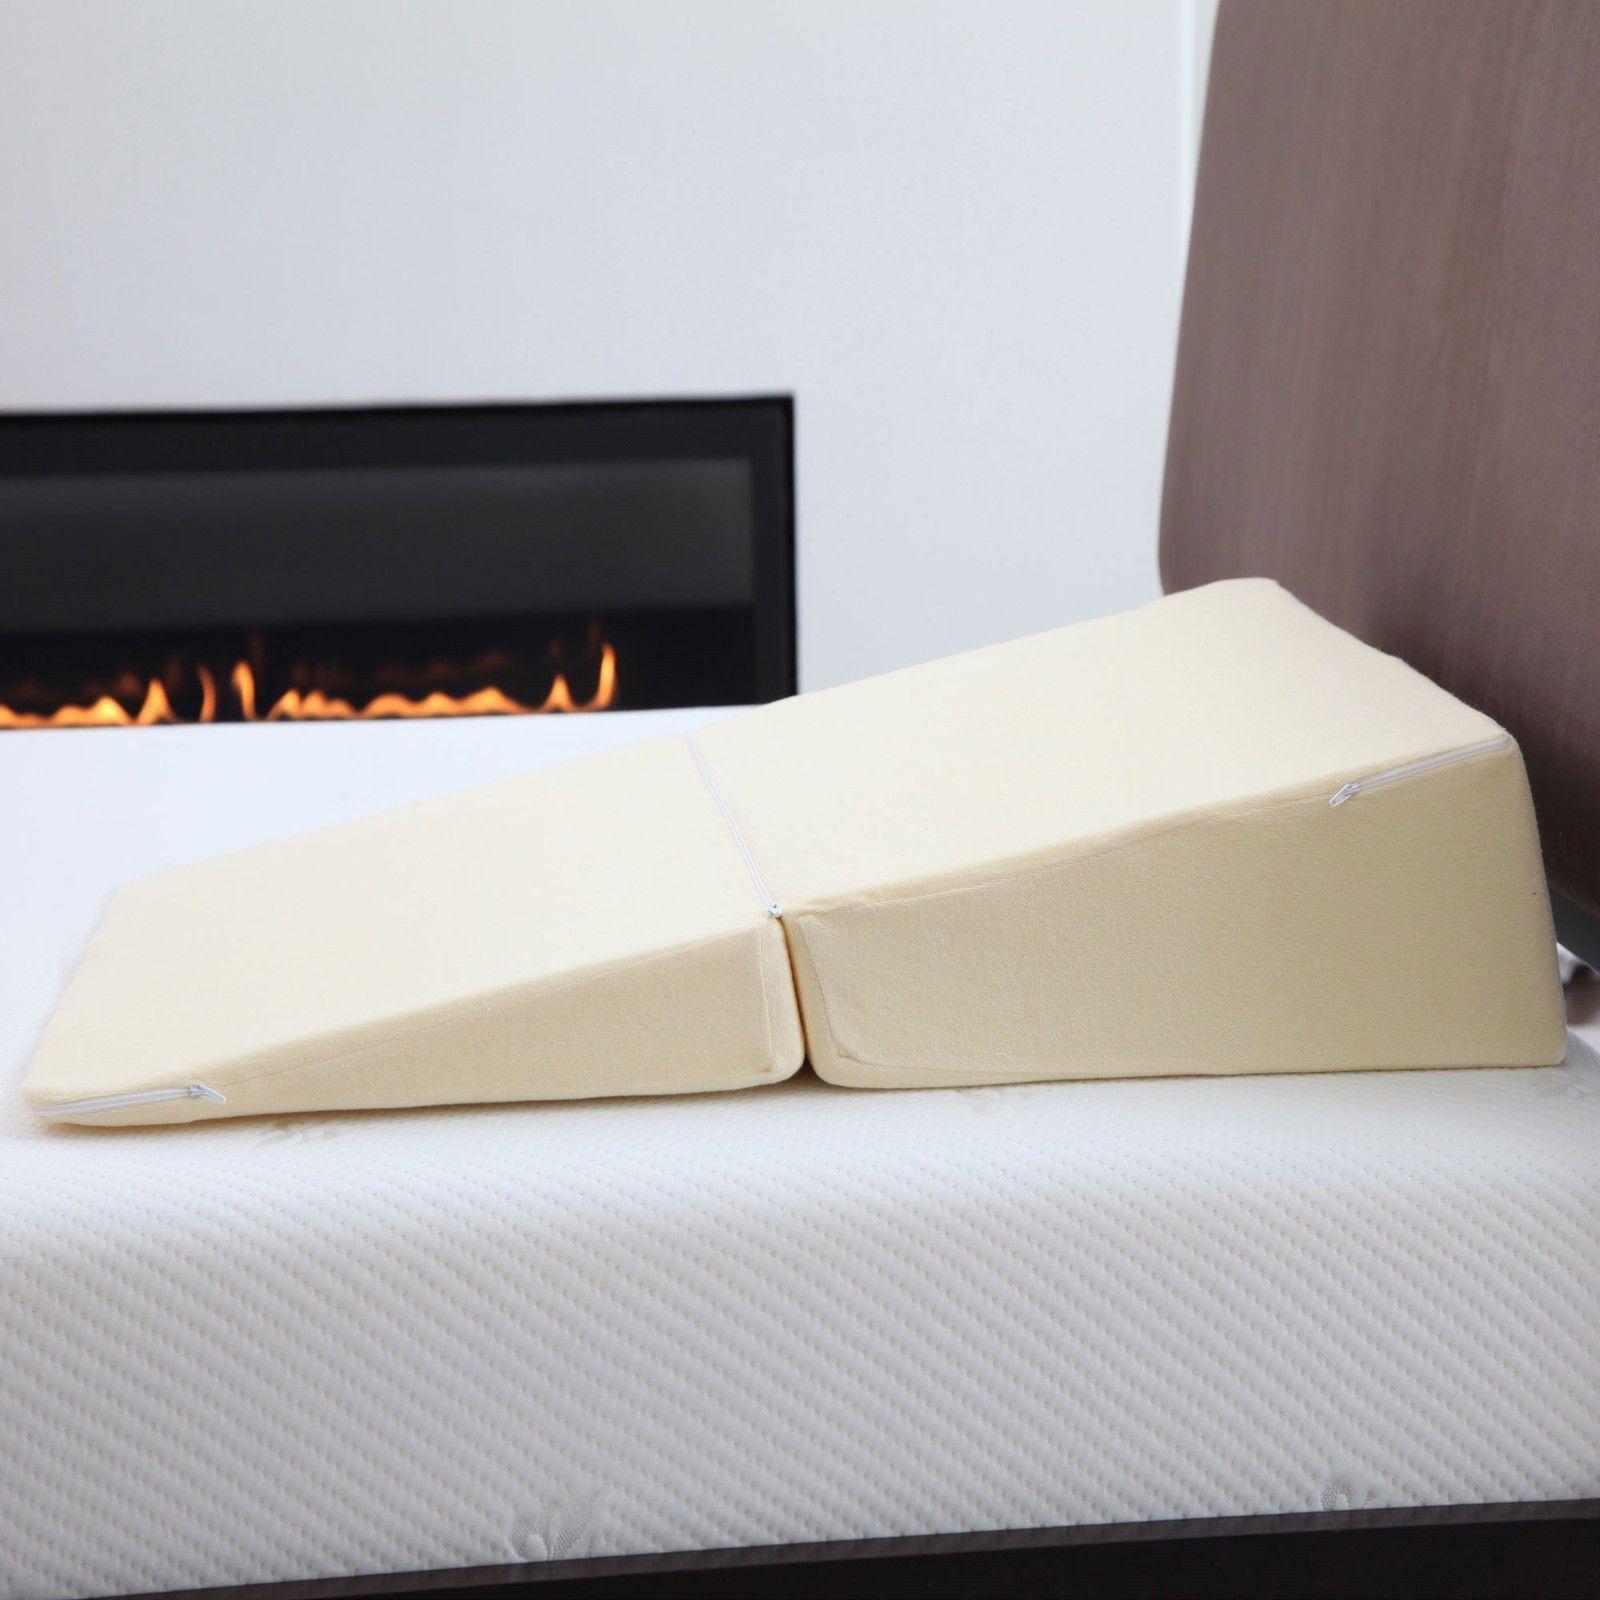 remedy natural pedic folding wedge memory foam pillow for acid